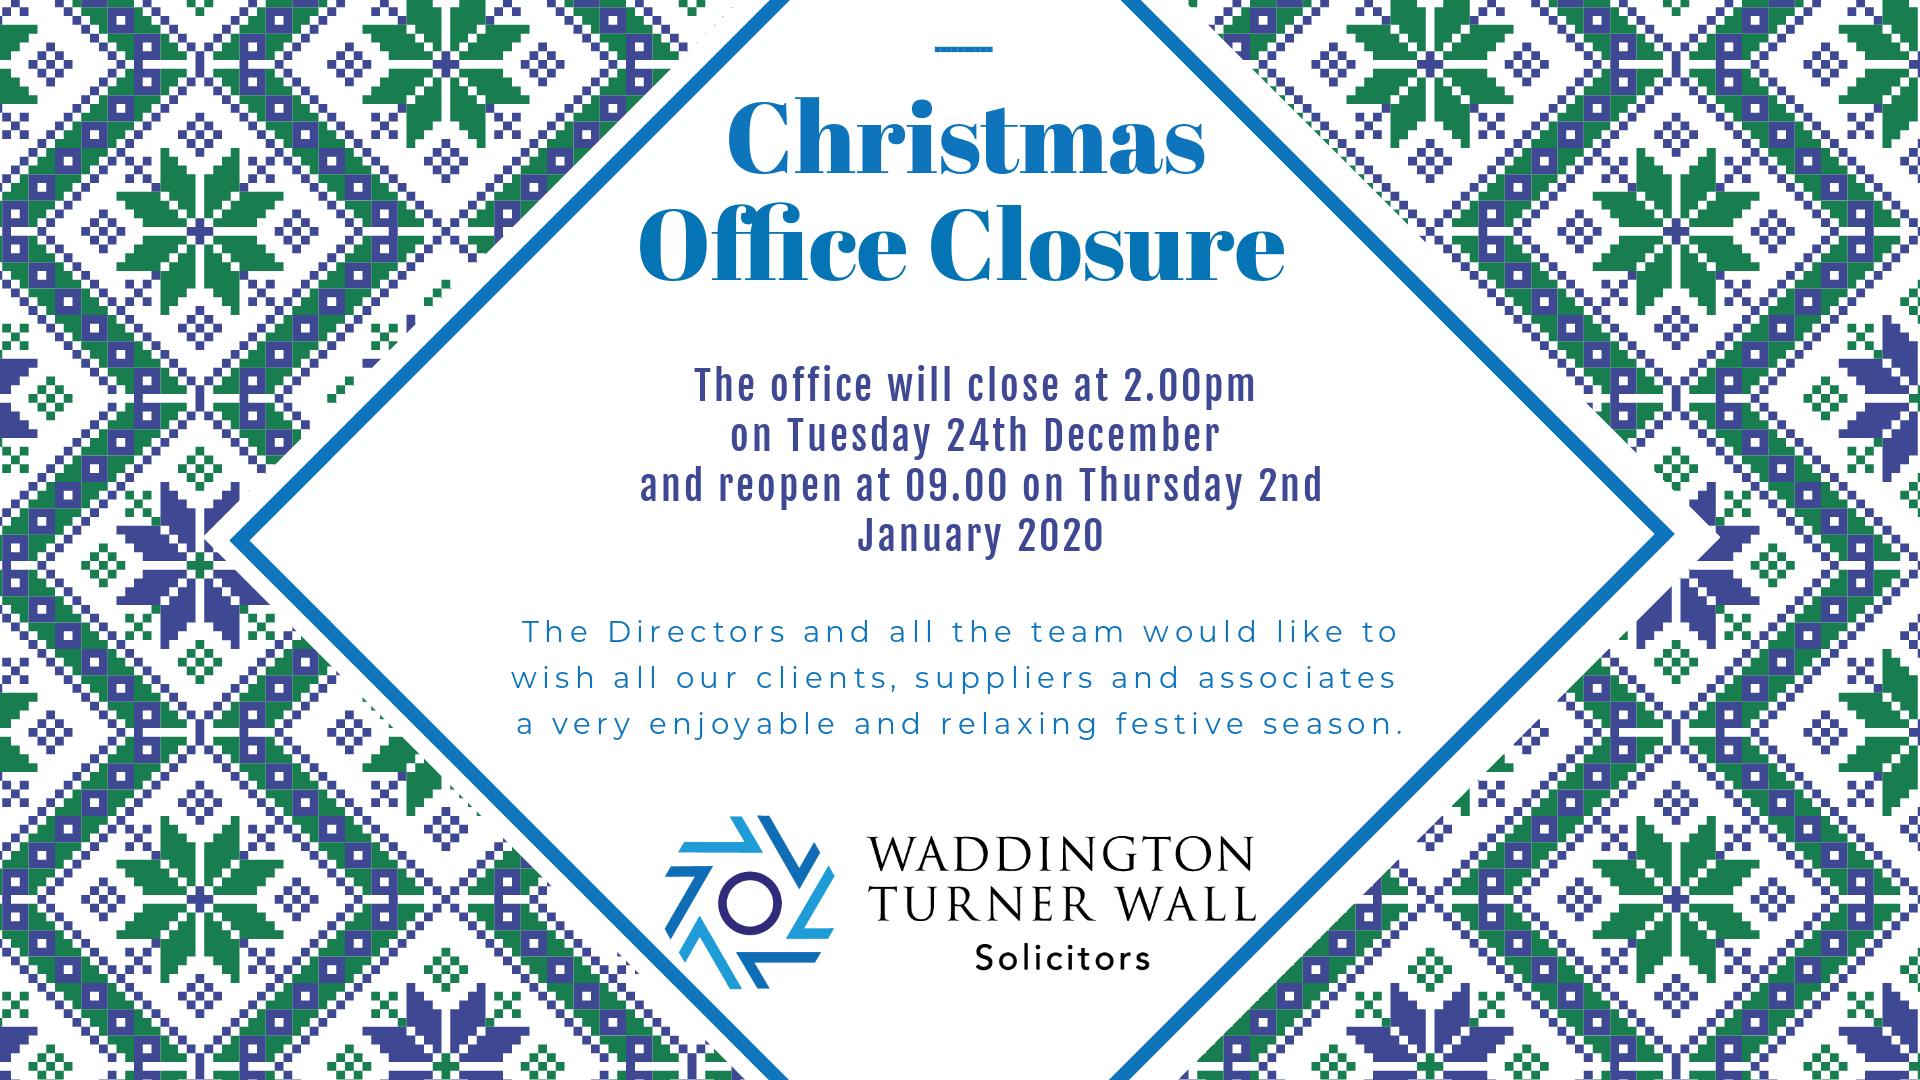 WTW Christmas Office Closure 2019